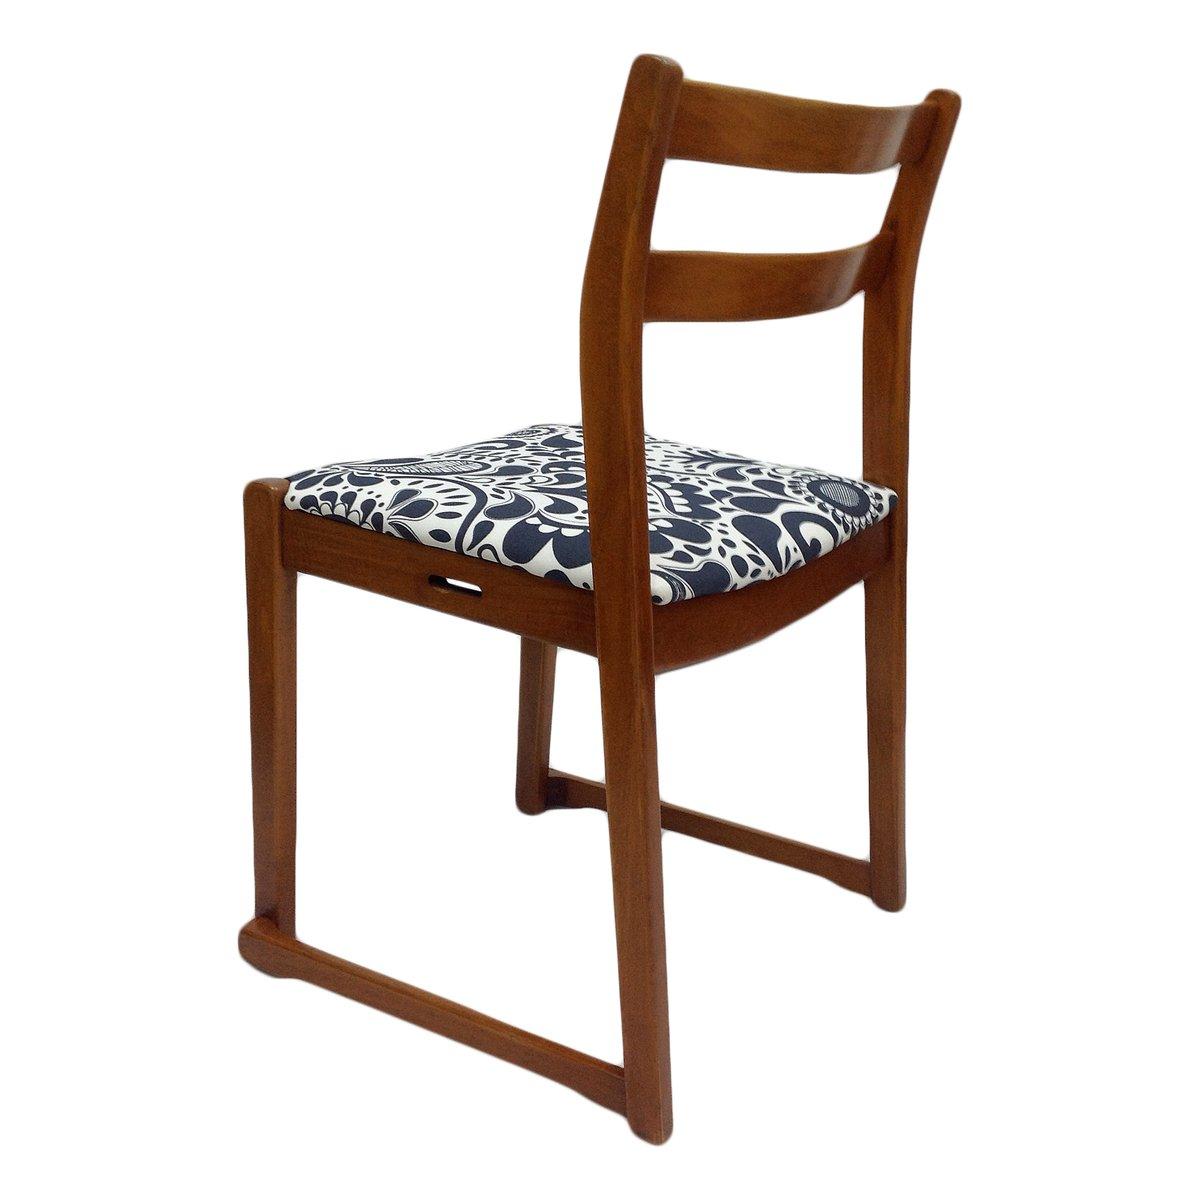 vintage teak stuhl mit gemustertem bezug bei pamono kaufen. Black Bedroom Furniture Sets. Home Design Ideas